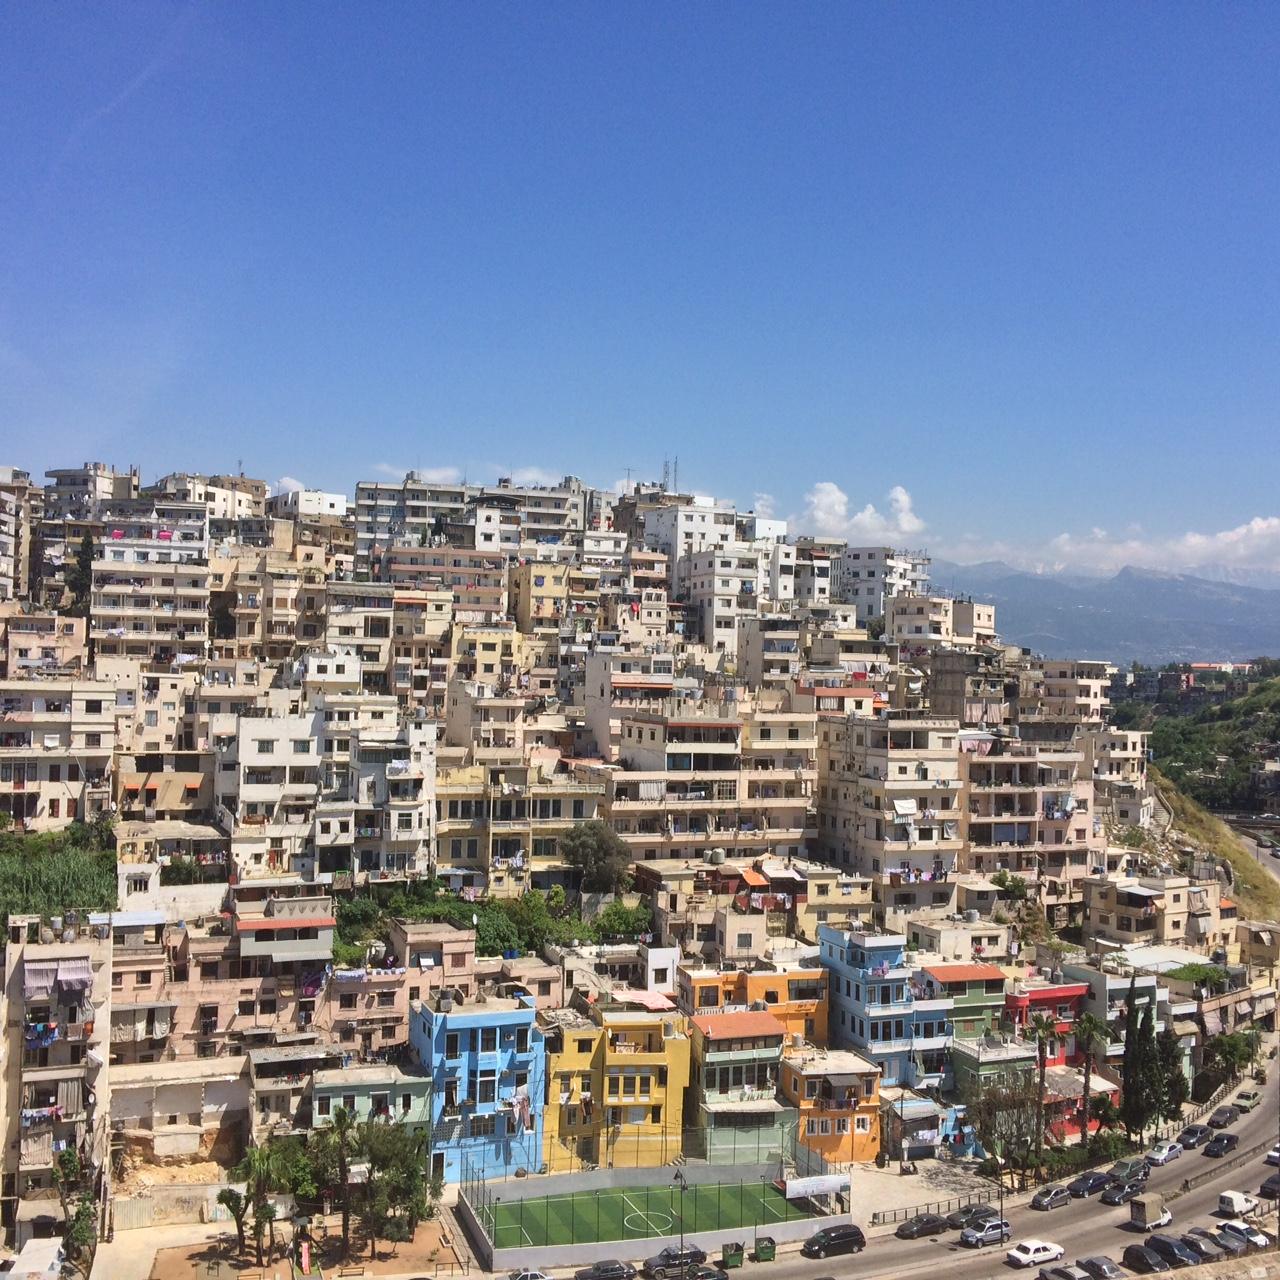 Ein Ausflug nach Tripoli im Libanon